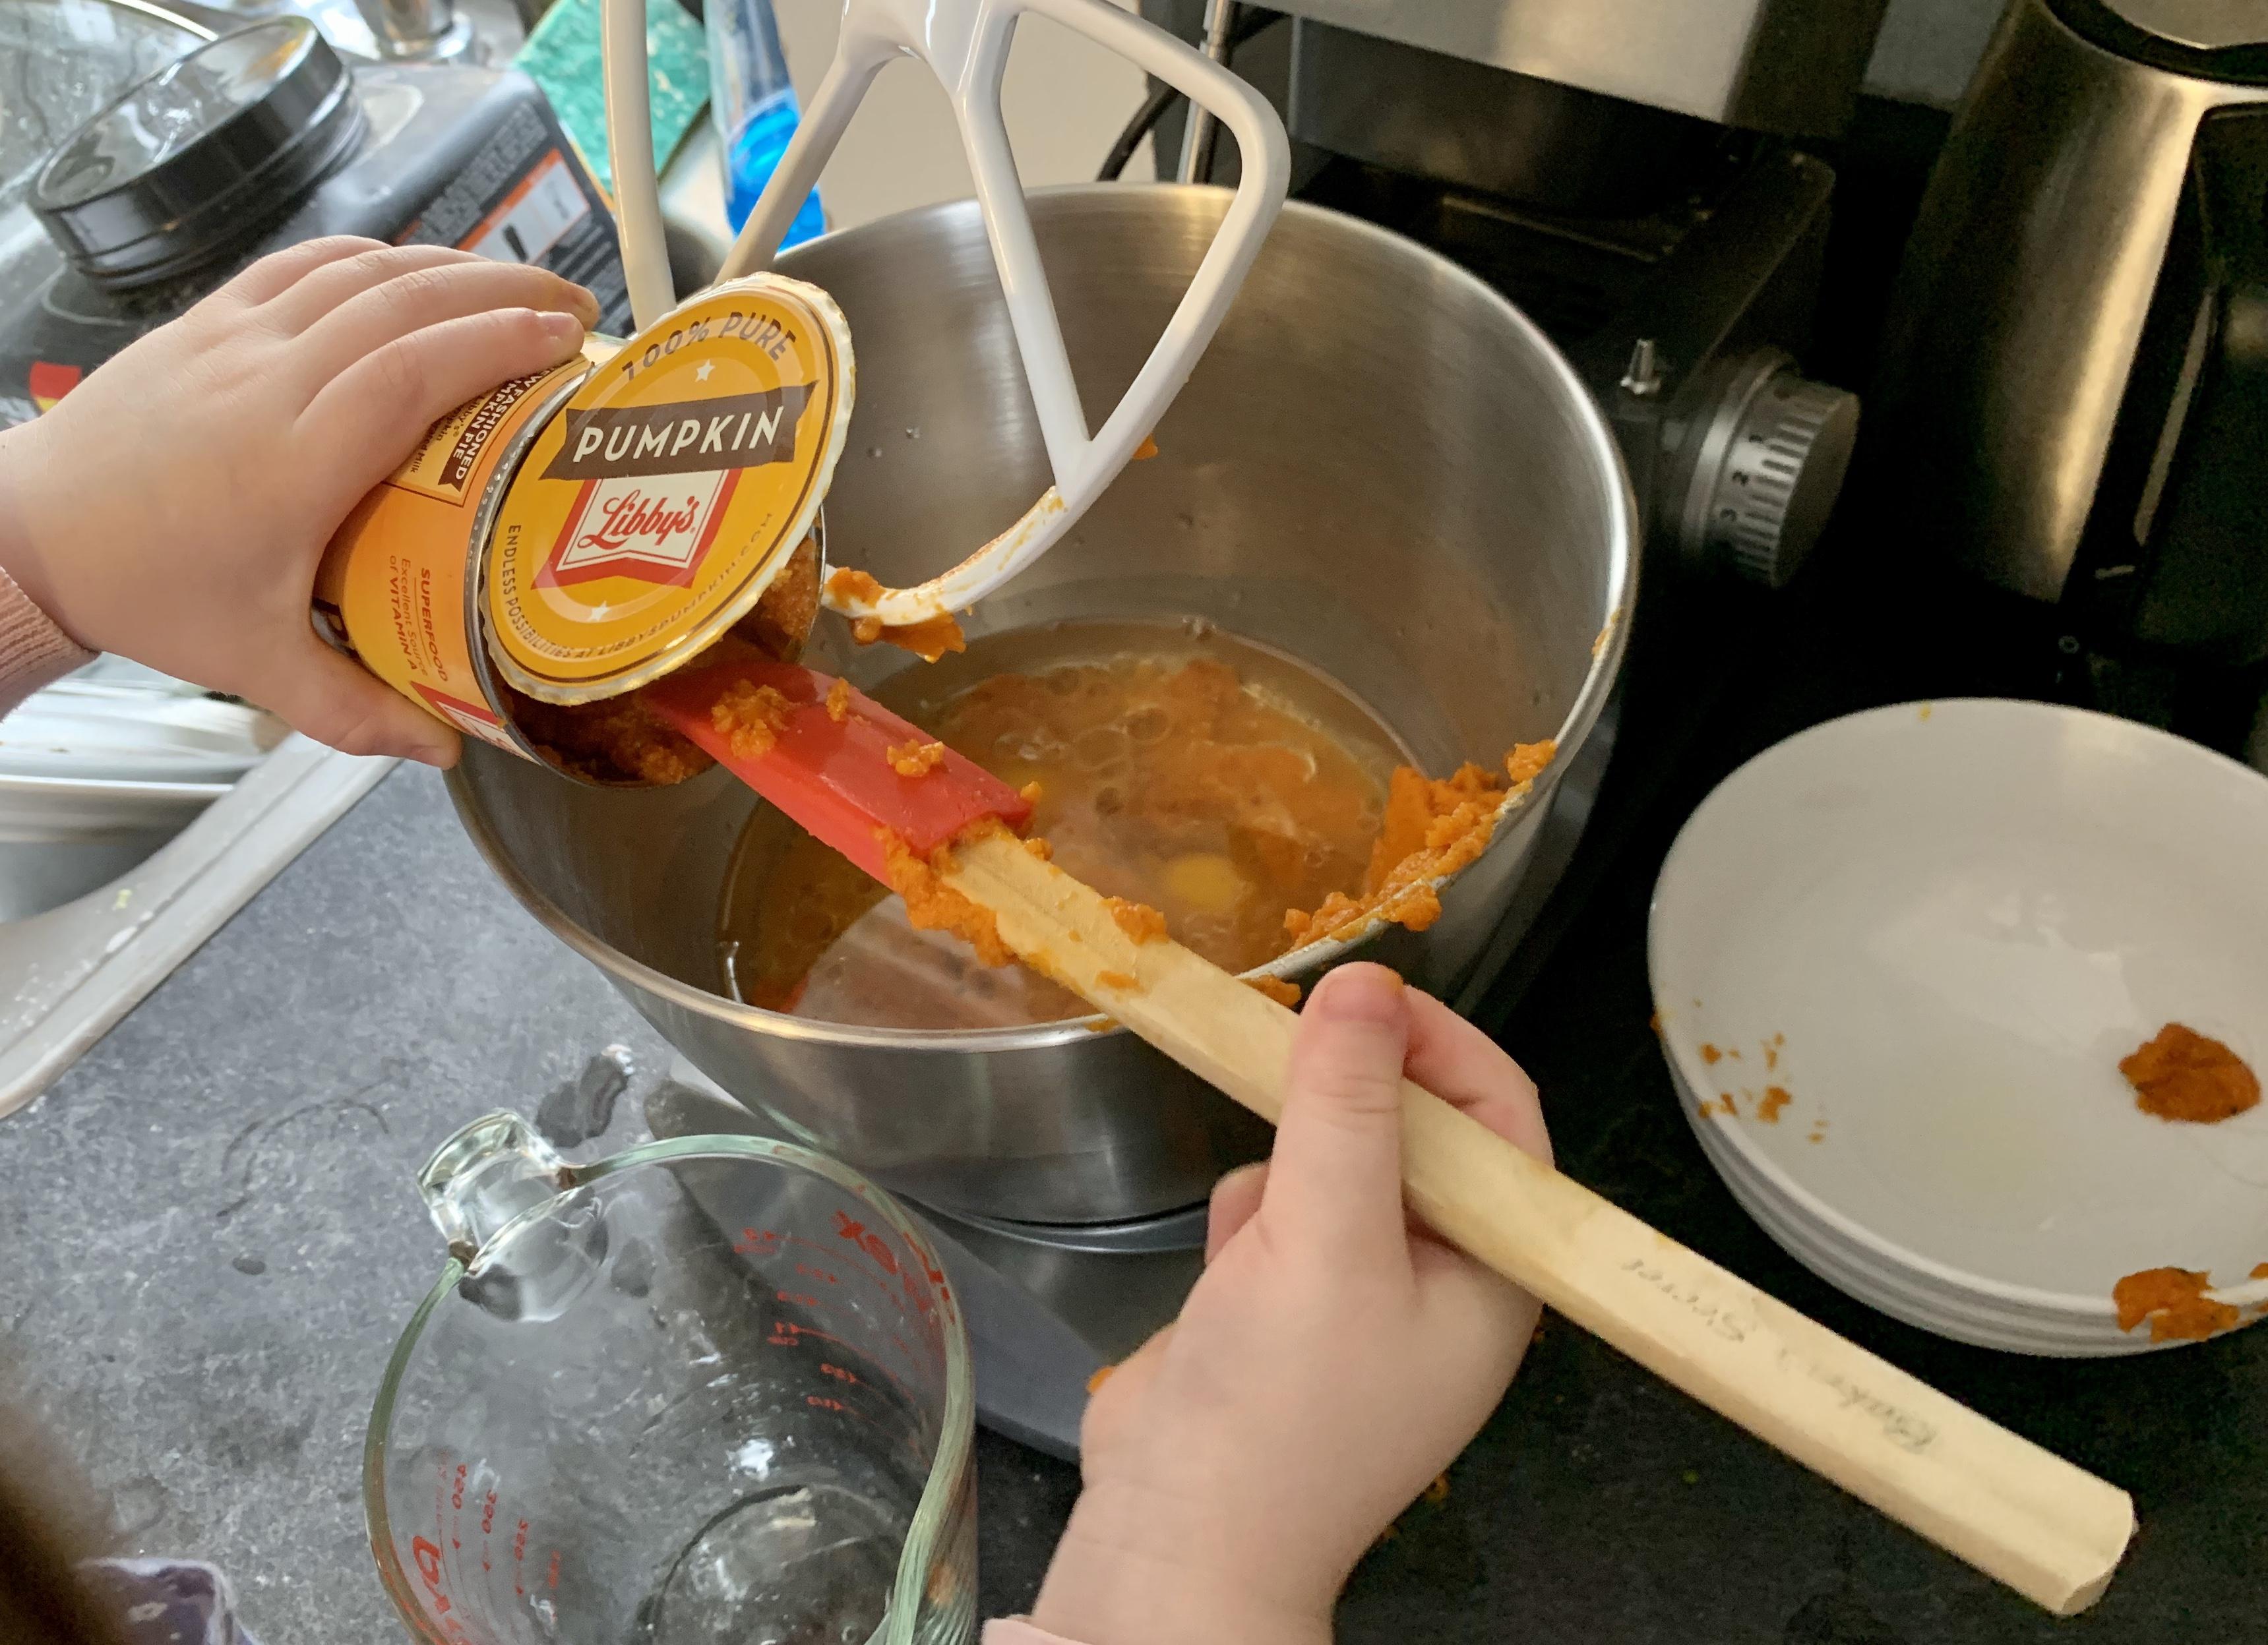 Scraping pumpkin into the bowl